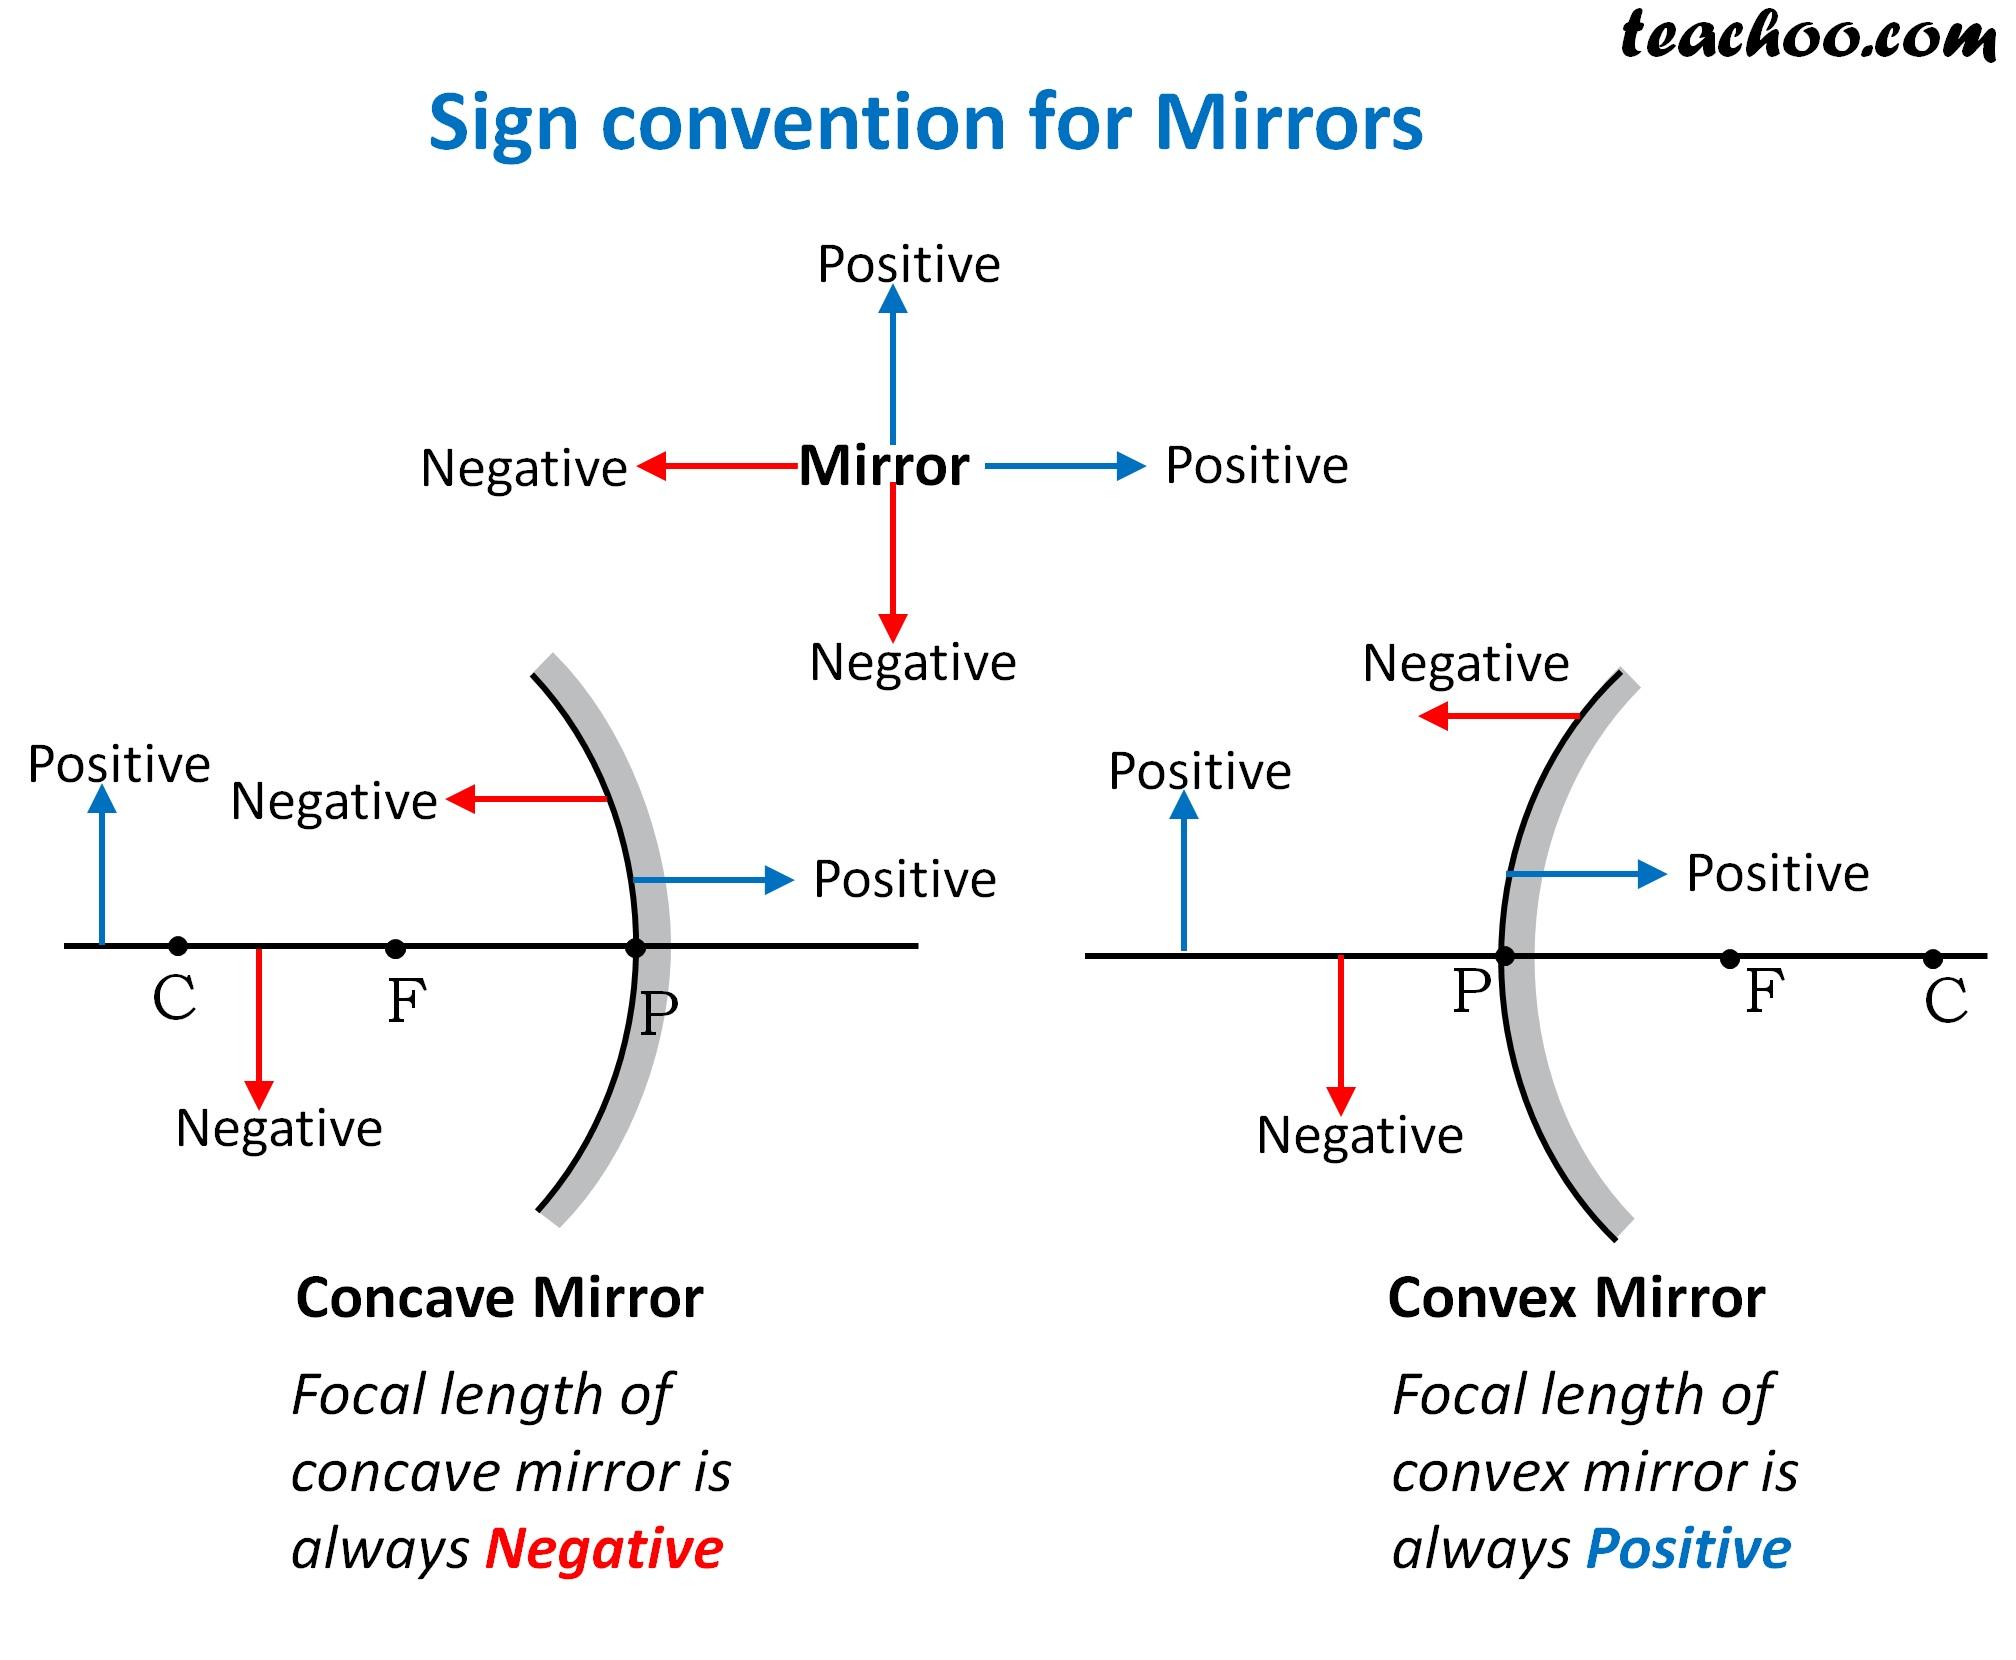 Sign convention for Mirrors - Teachoo.jpg